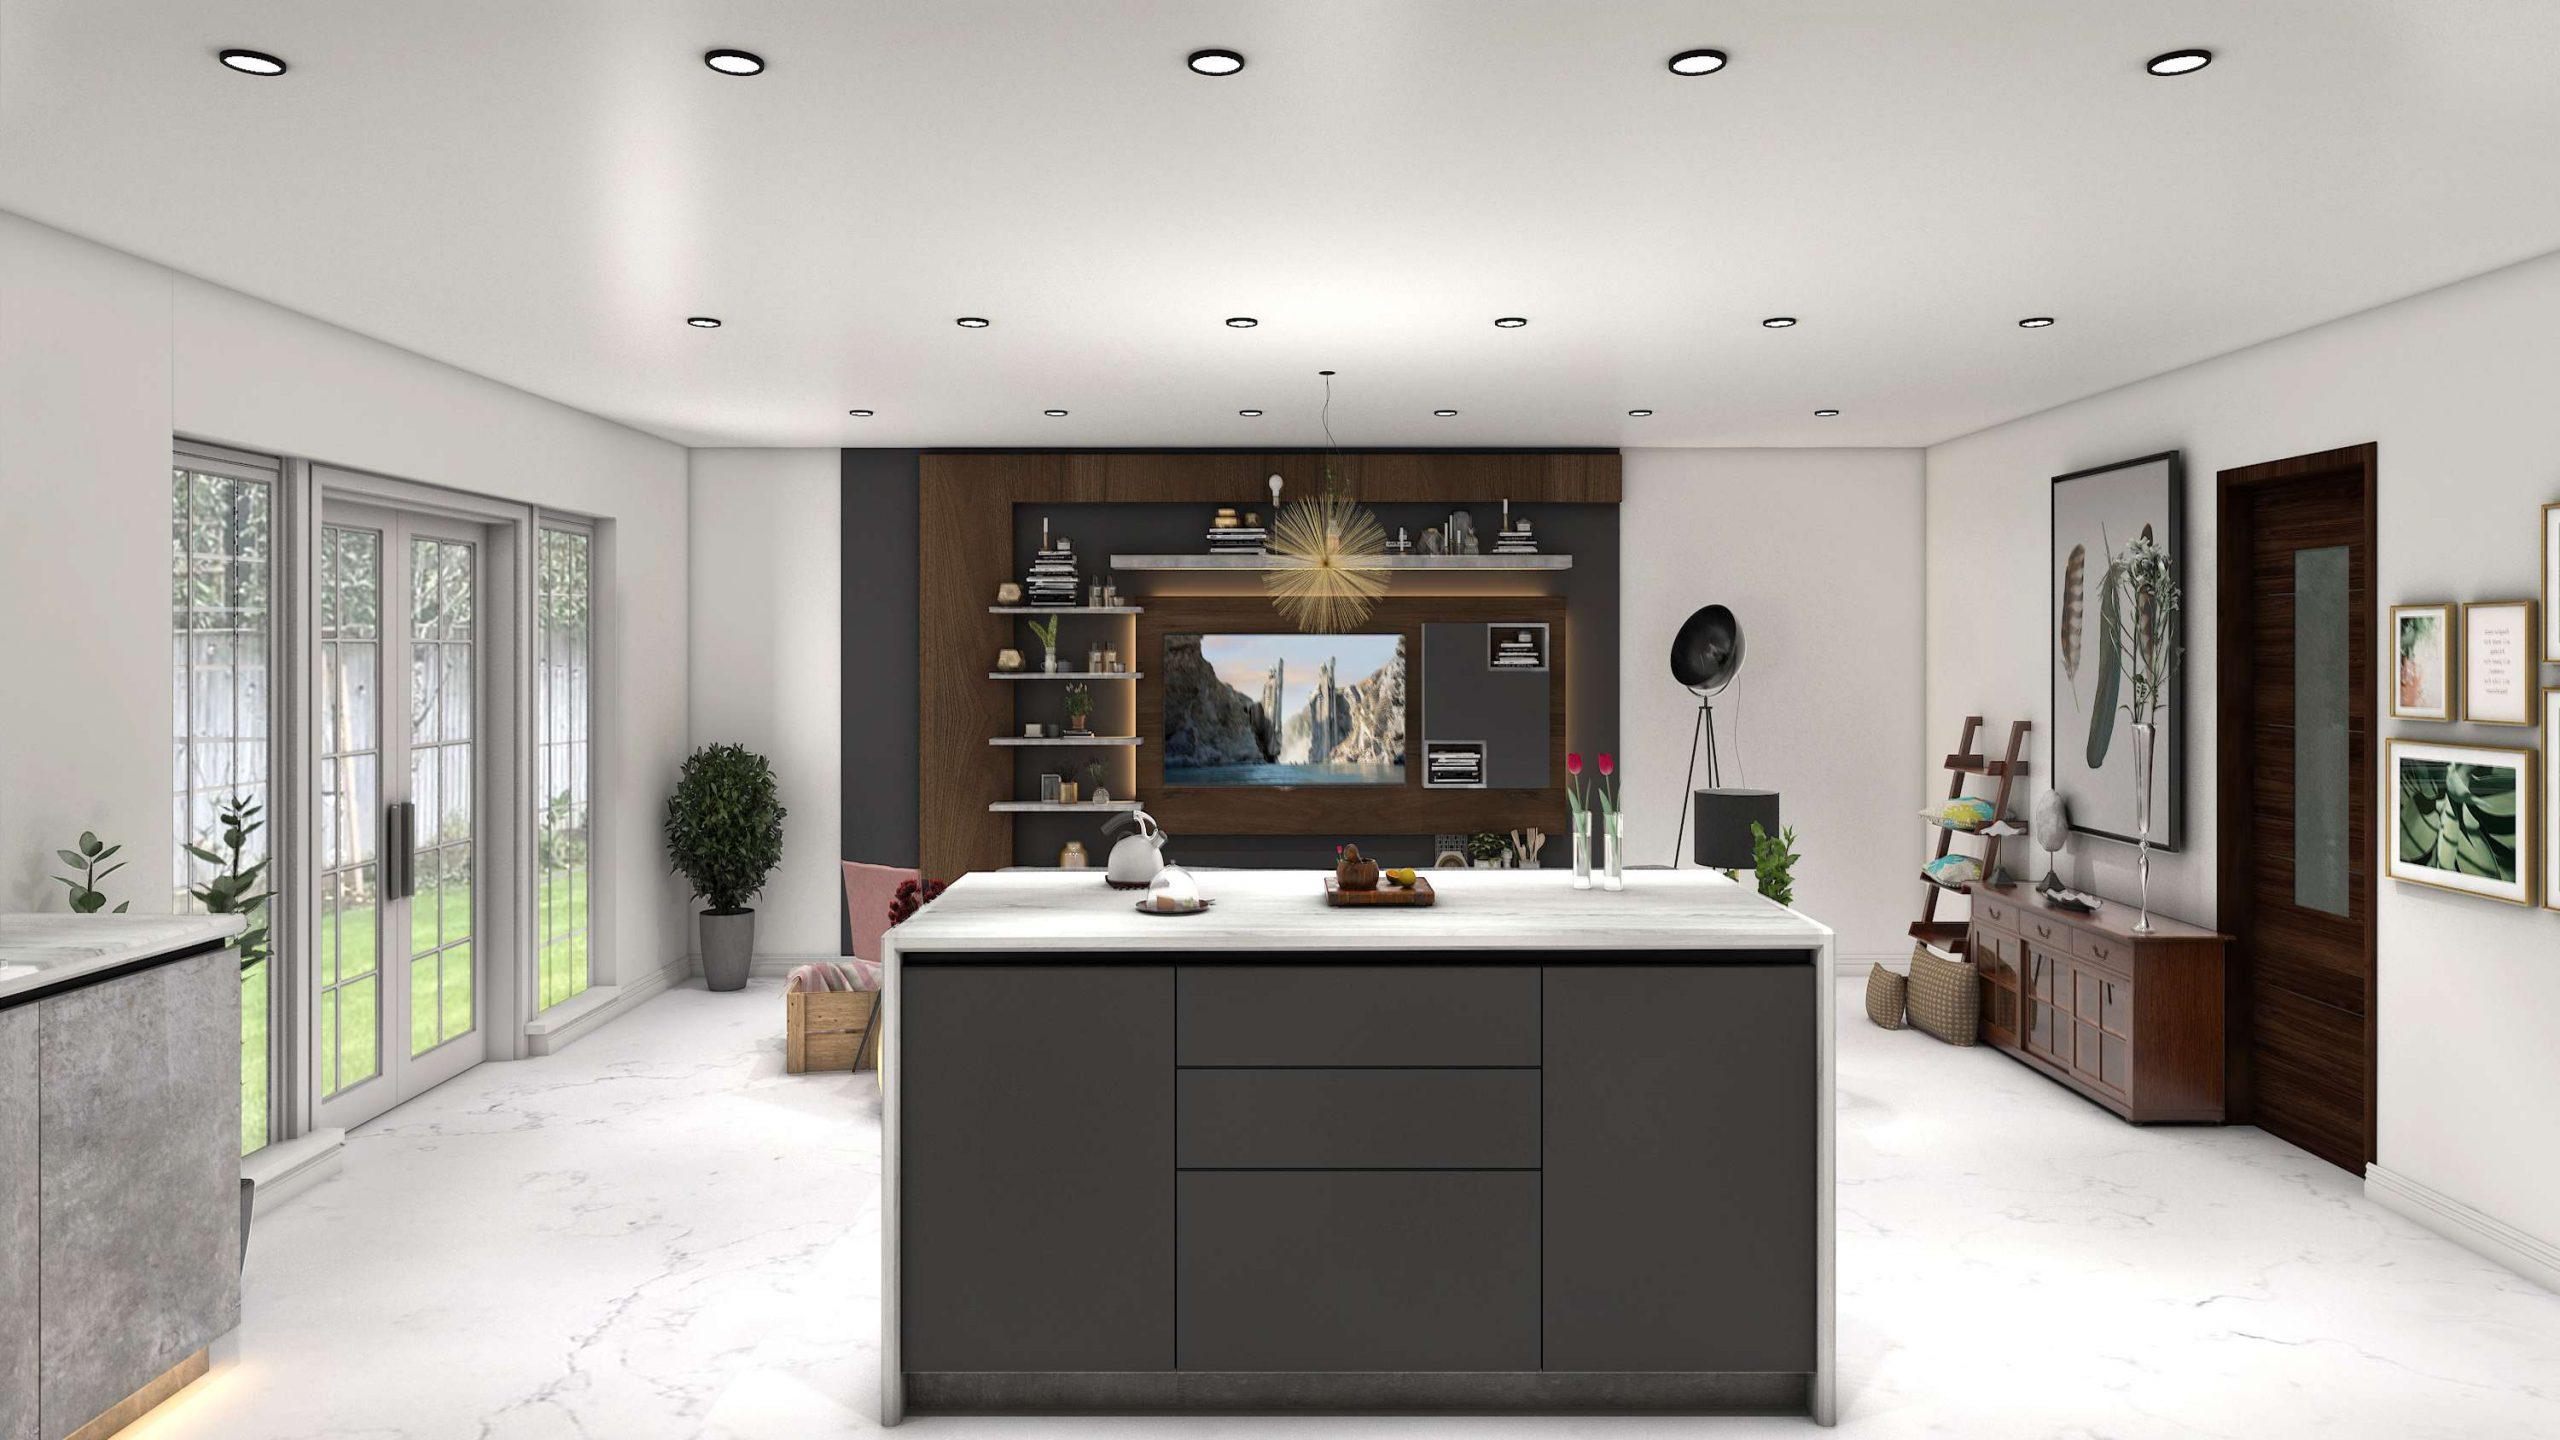 south park drive kitchen